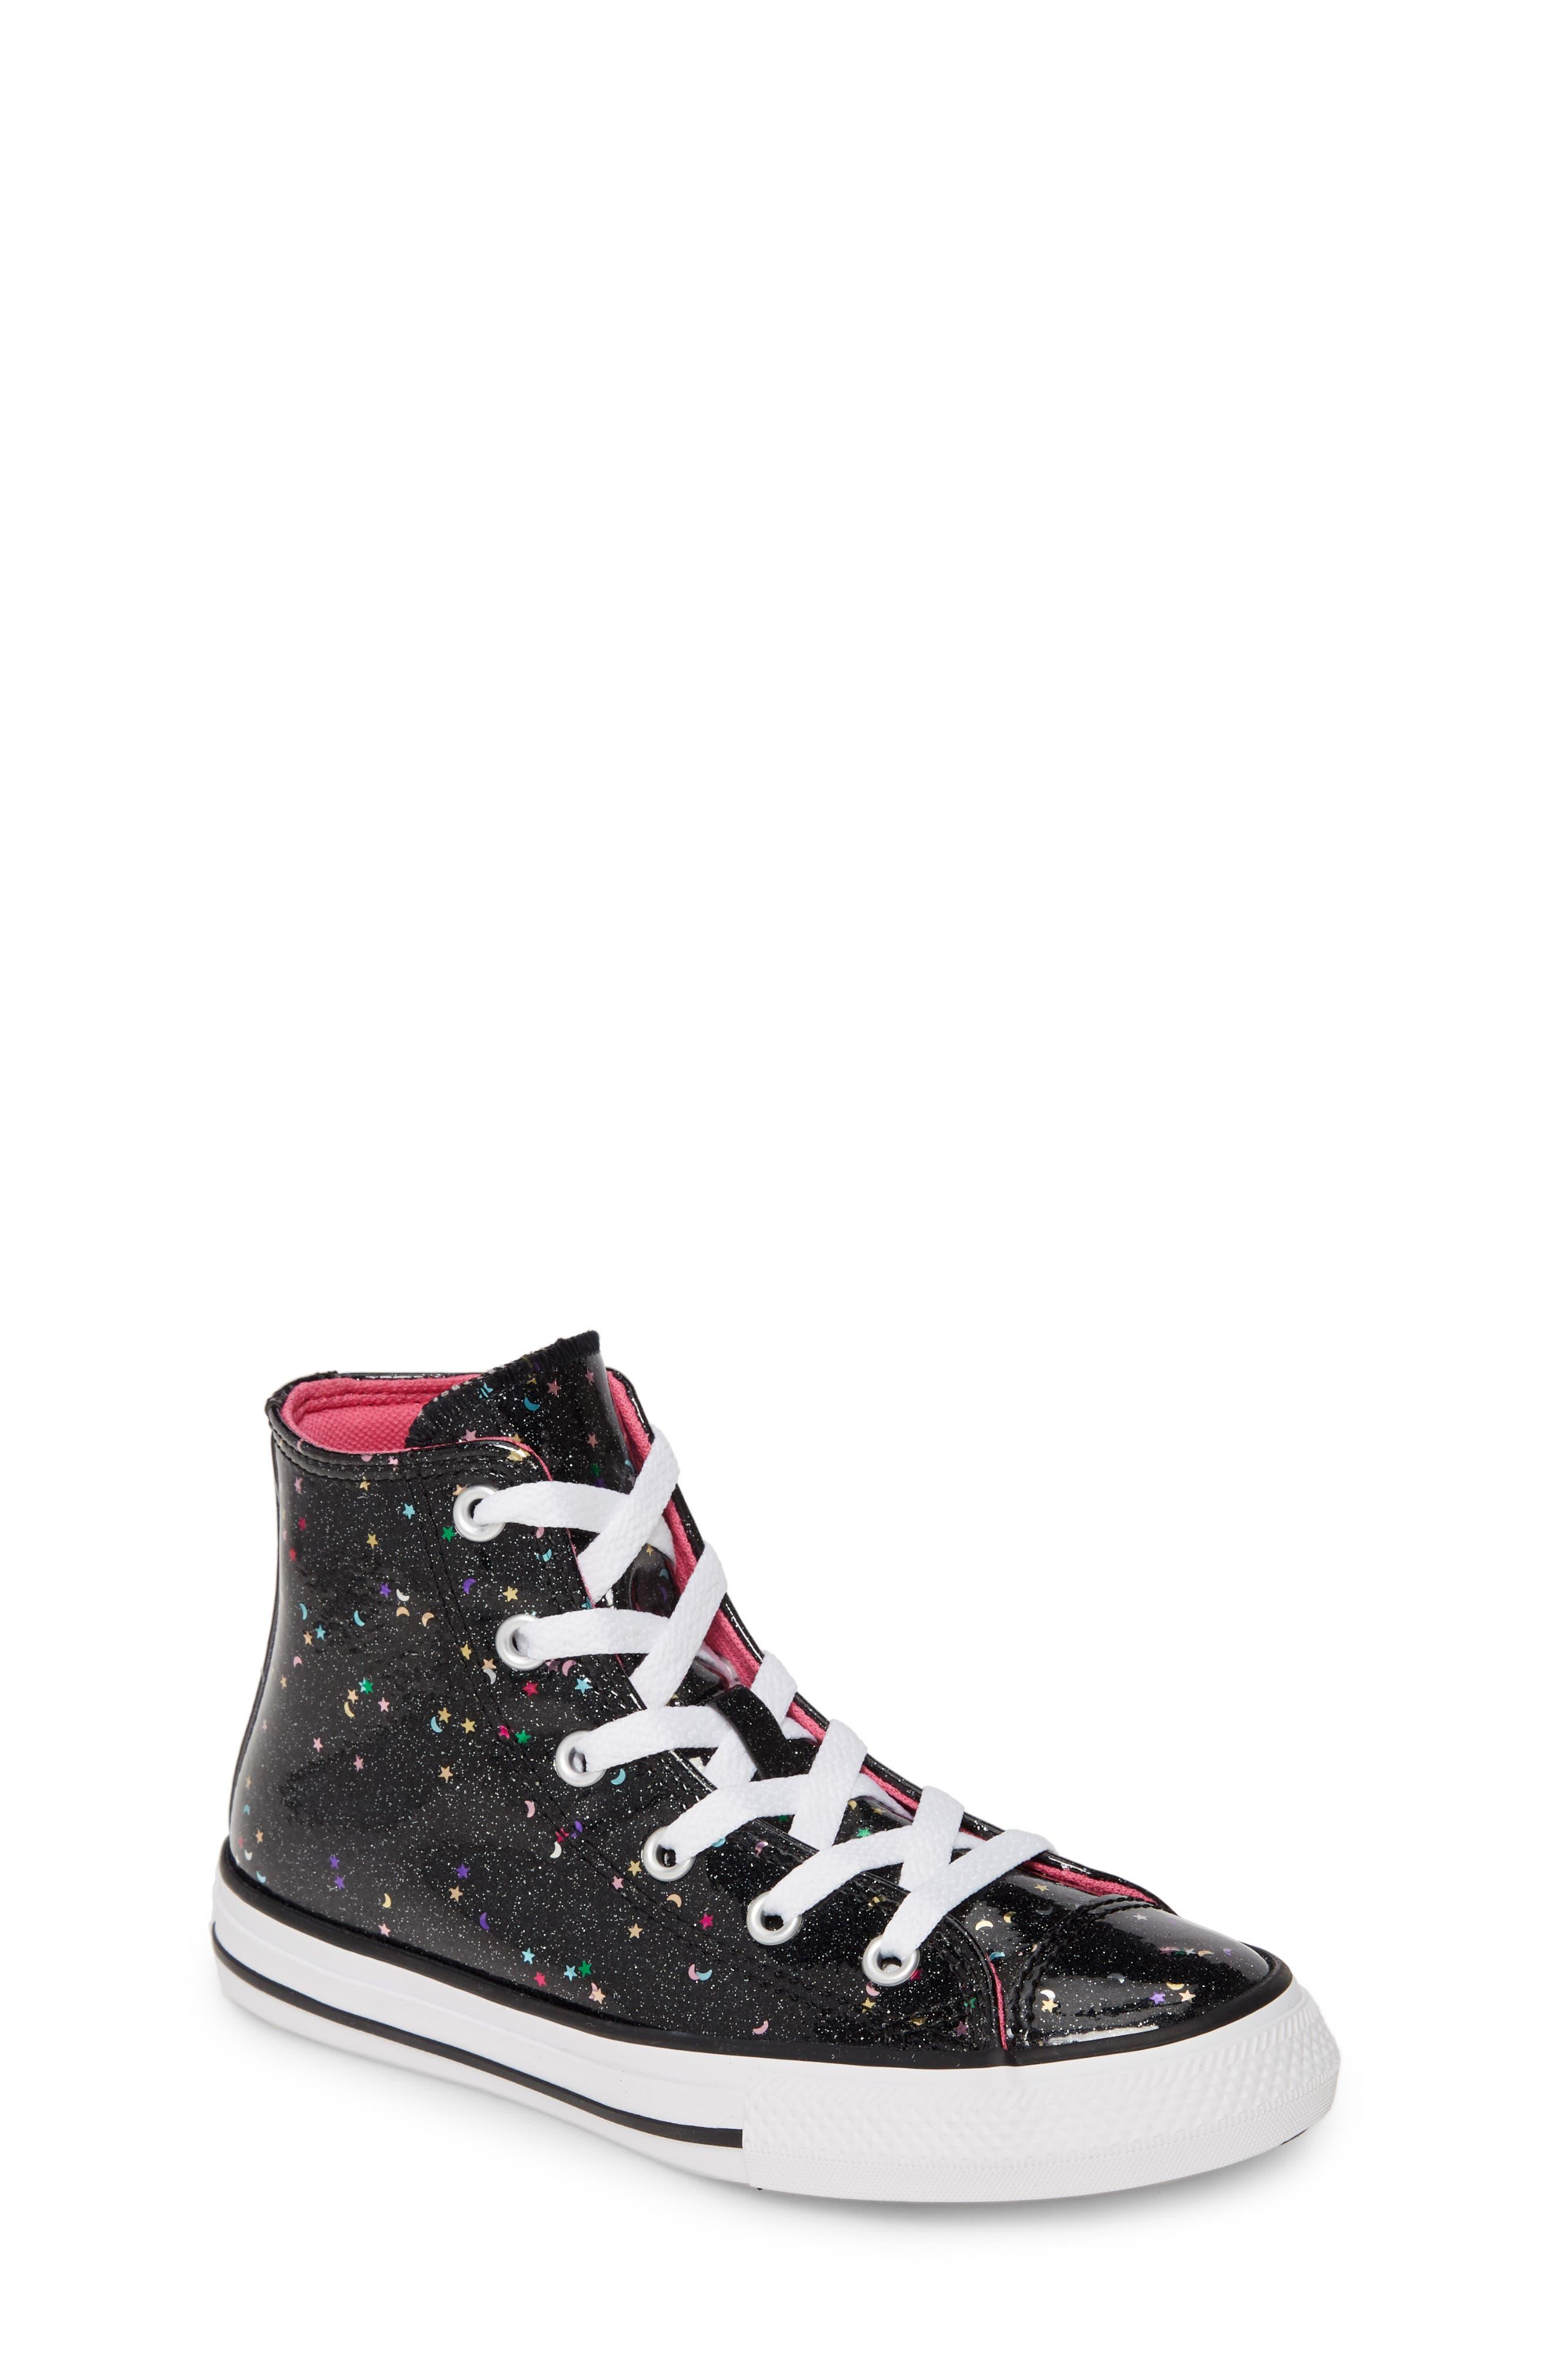 Converse Women's Converse X Chiara Ferragni 70 Hi One Star Glitter Platform Sneaker, Size 8 M Metallic from NORDSTROM | People